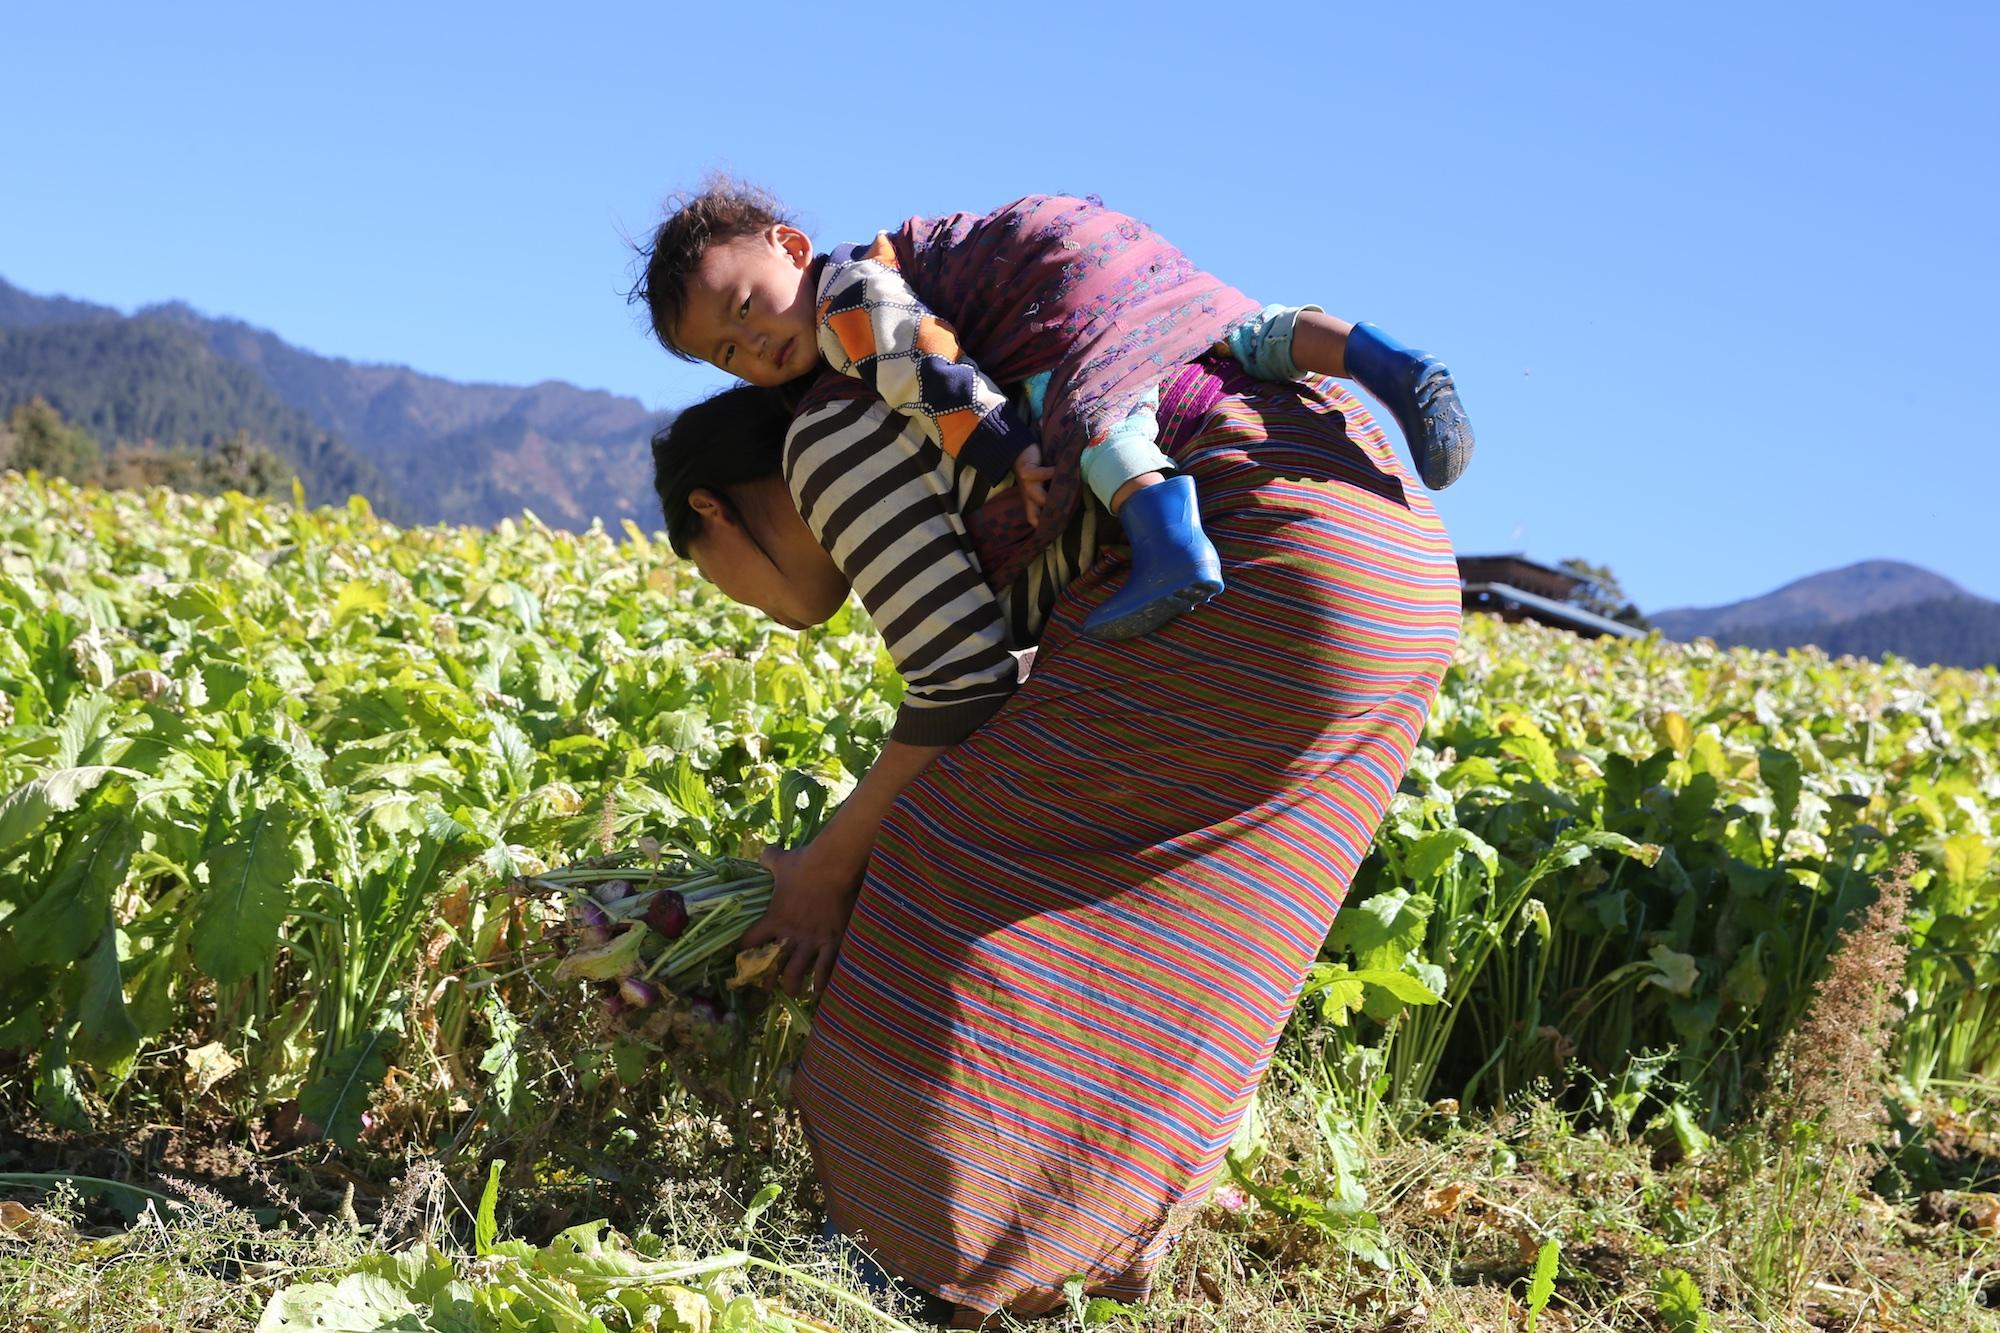 Bhutan-2016- C26O0025.jpg